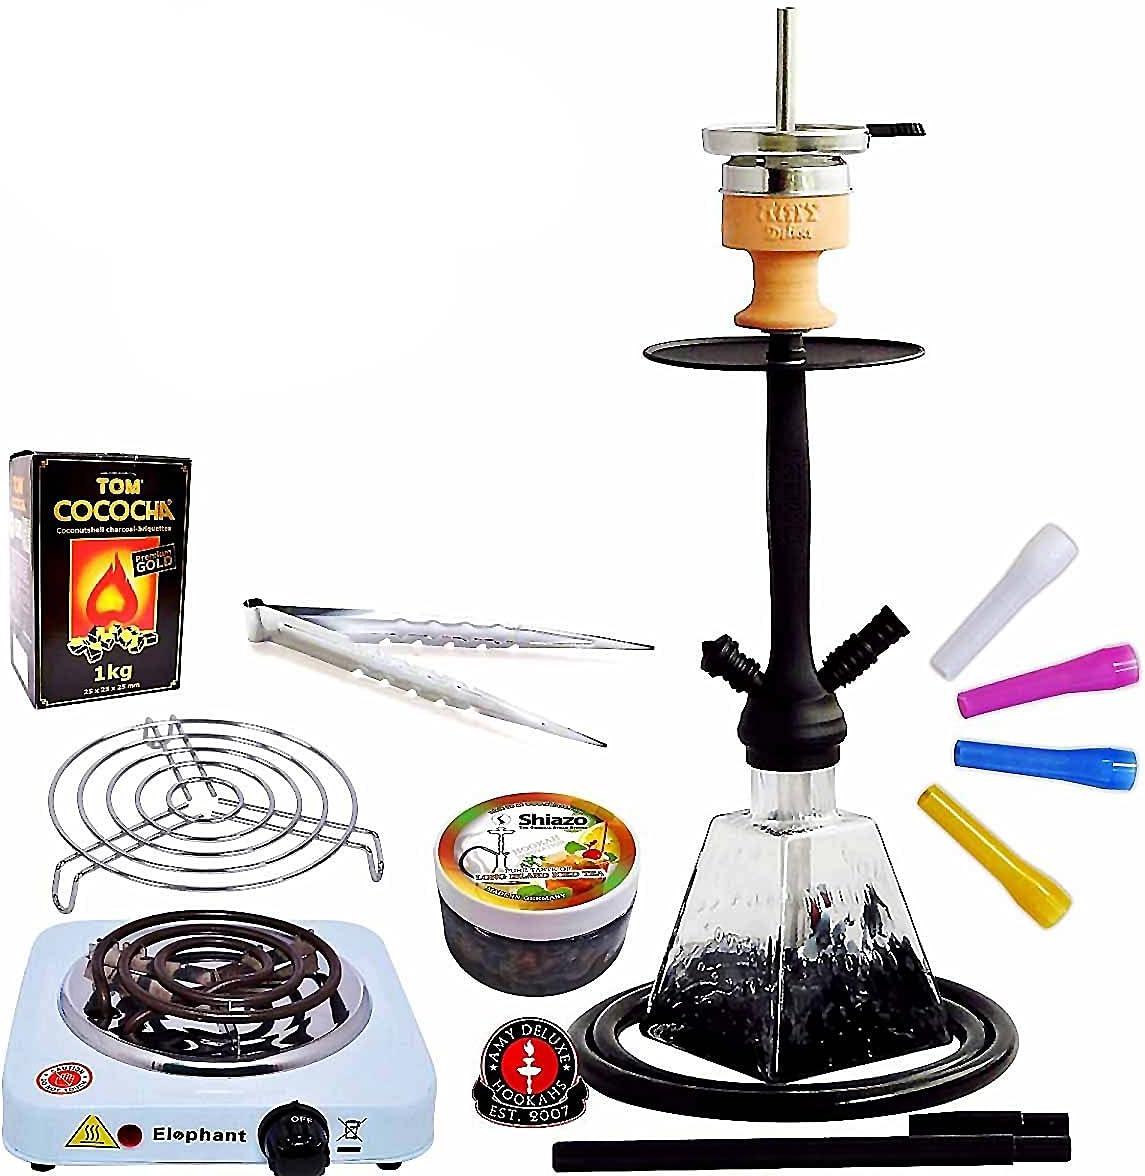 Amy Deluxe I need you 038 - Set de shisha con chimenea, 60 cm, de click, tubo de silicona, piedras de vapor Shiazo, encendedor de carbón TOM Cococha ...